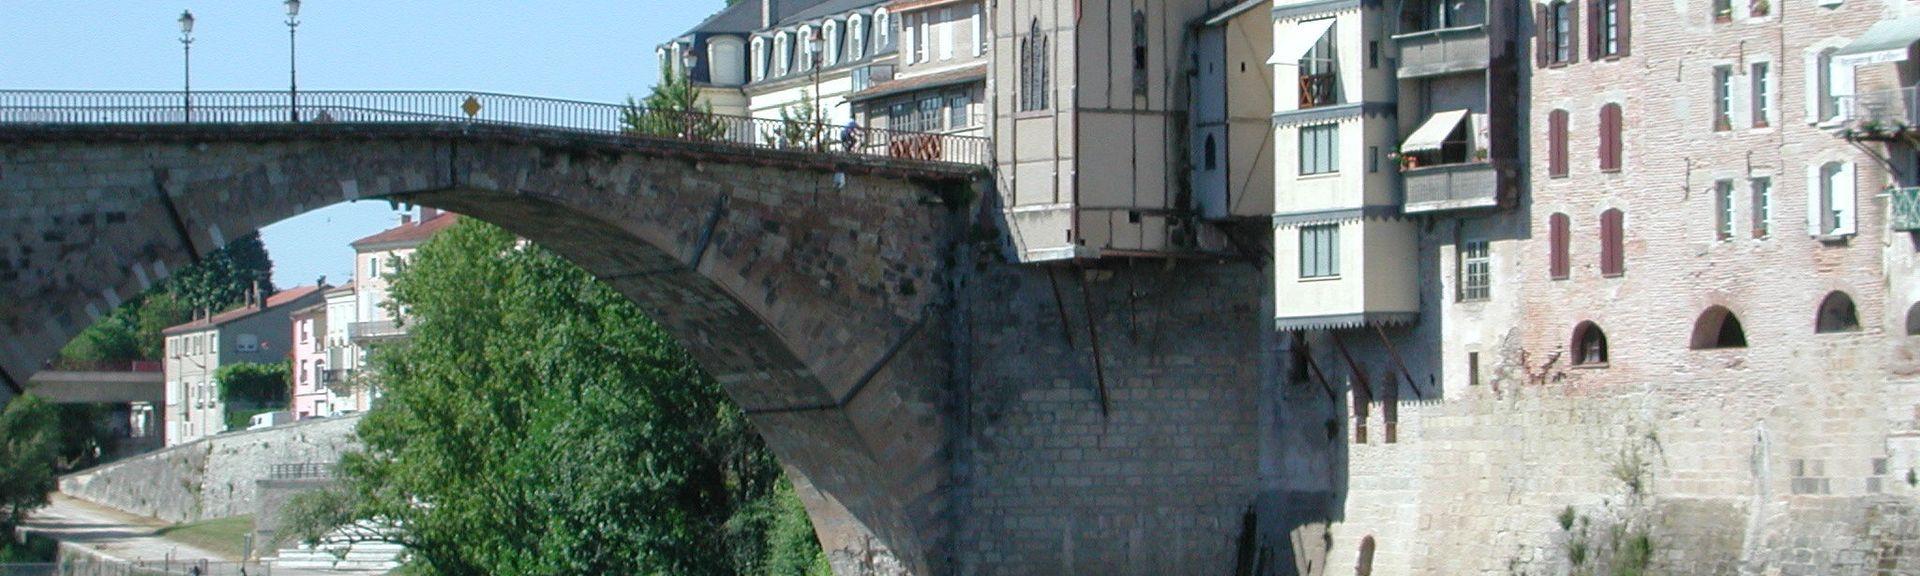 Lagarrigue, Lot-et-Garonne, France